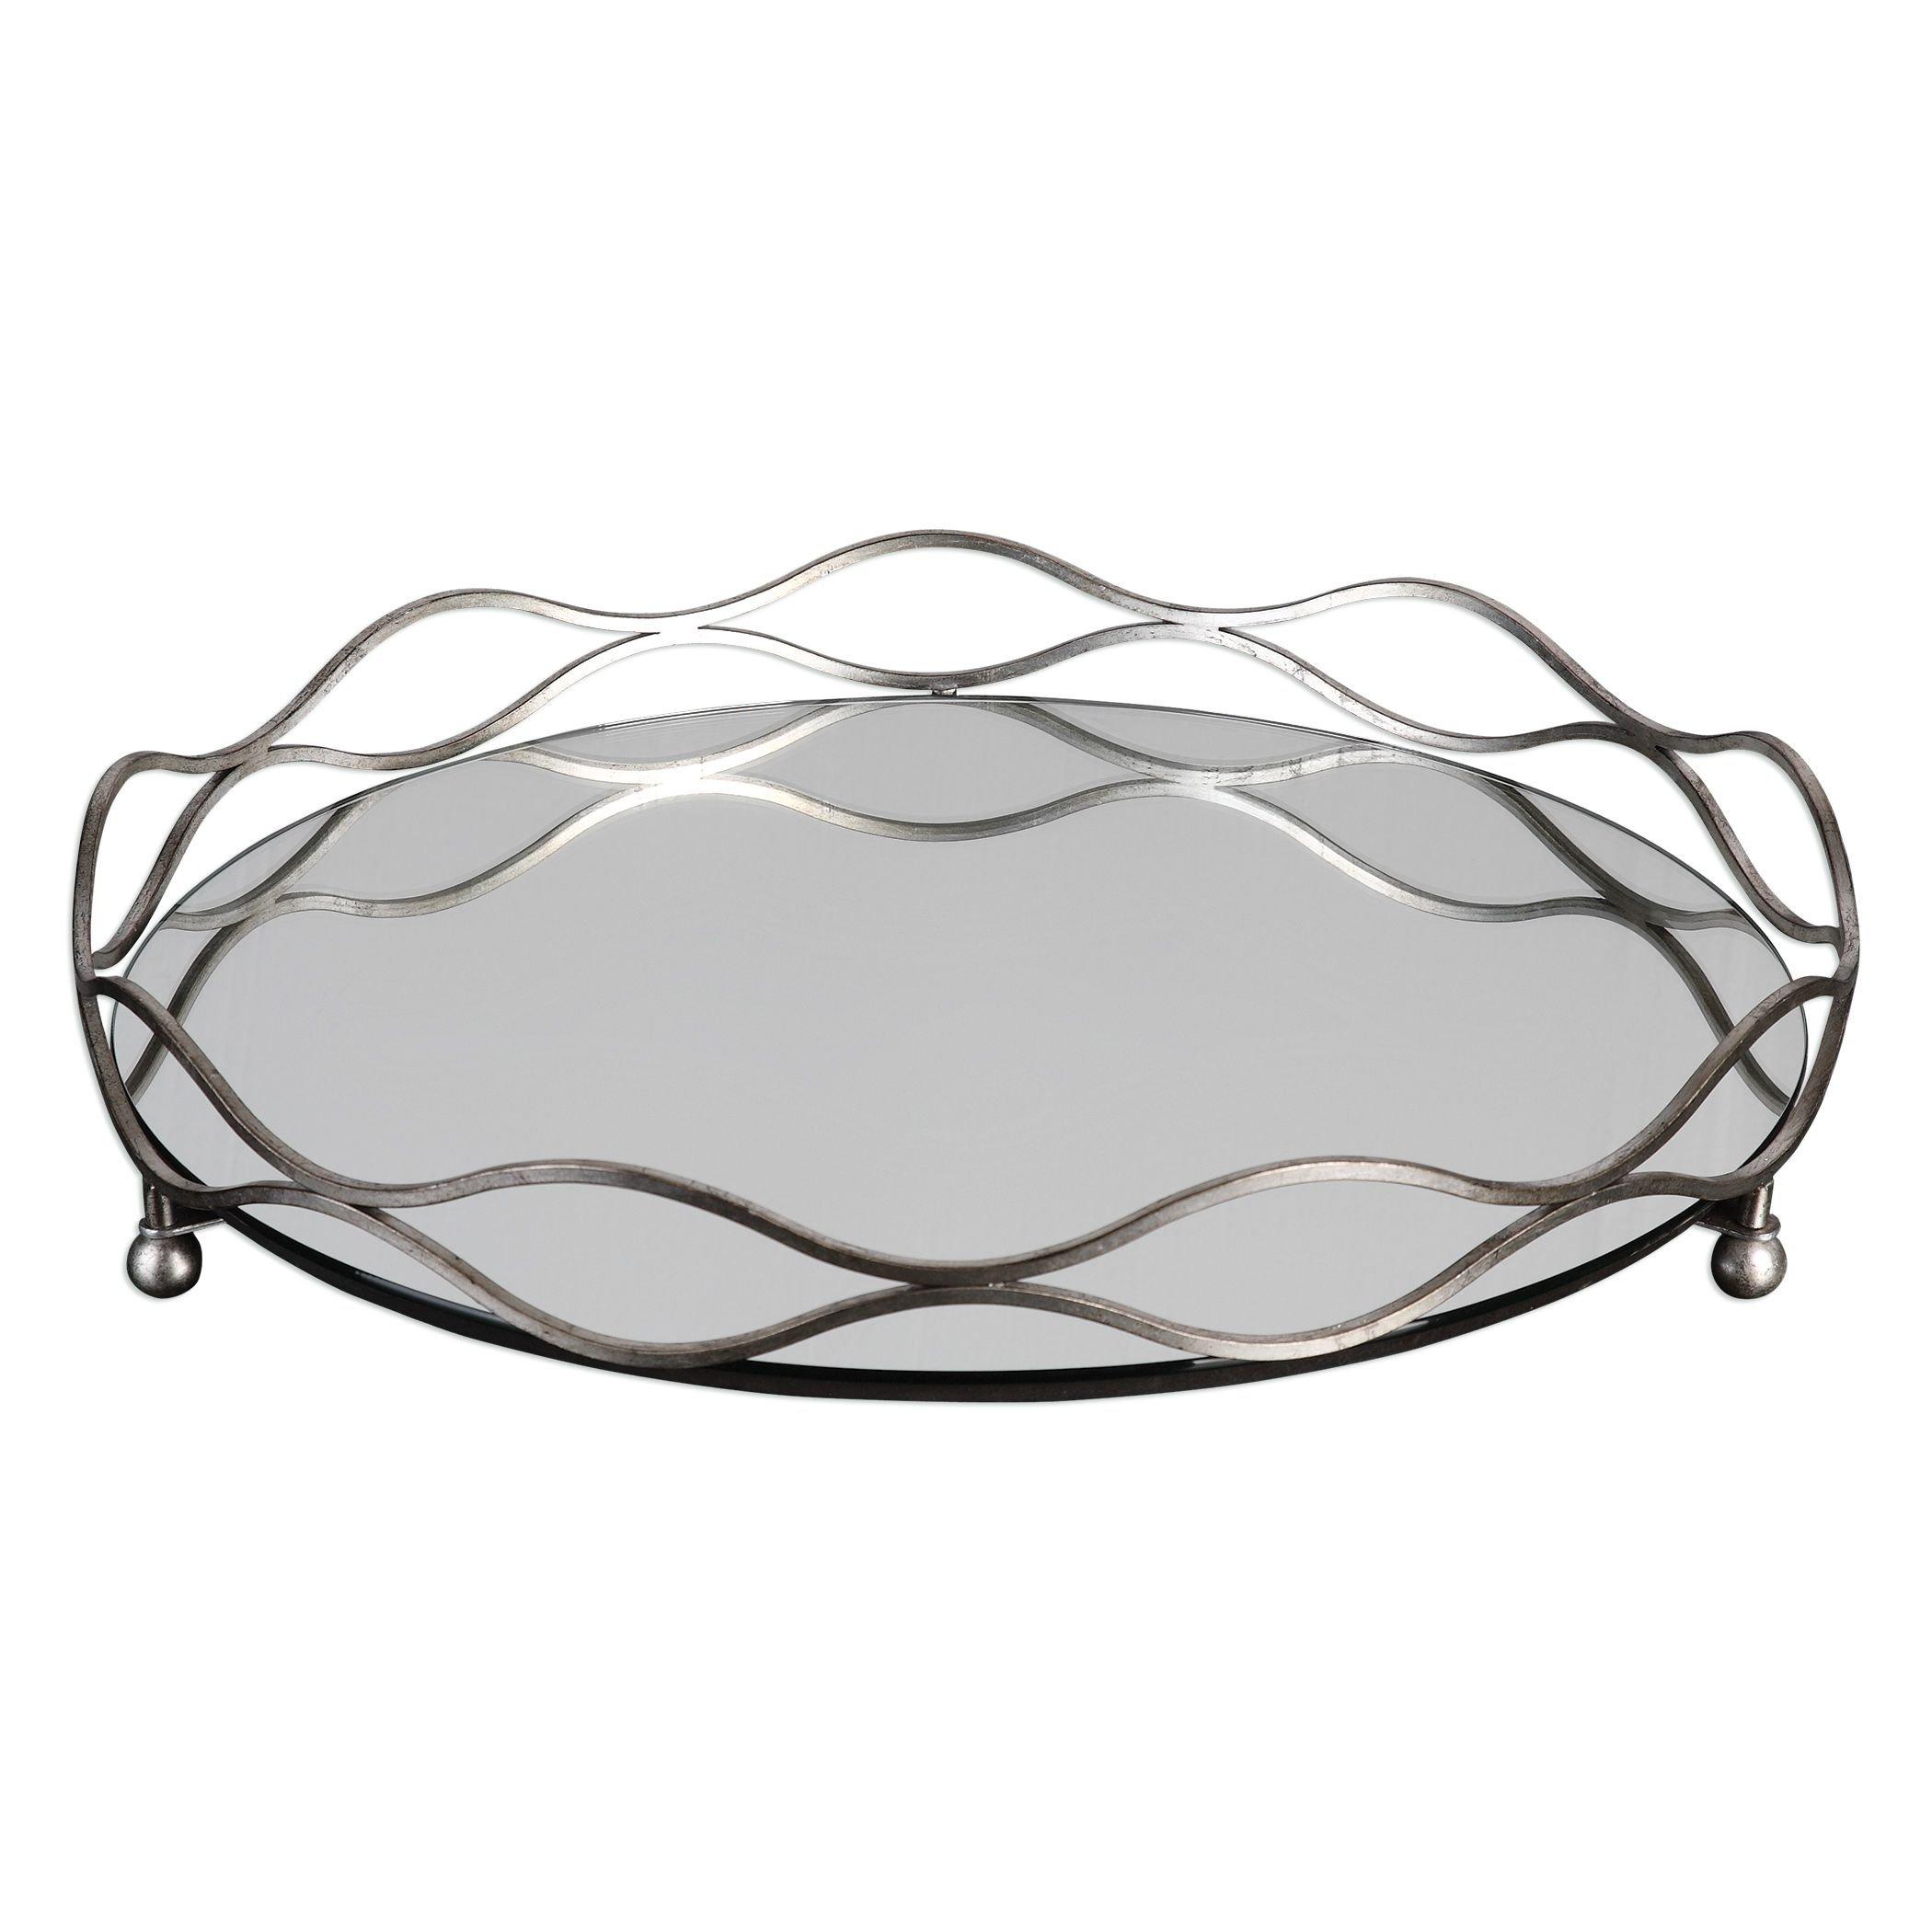 Elegant Round Mirrored Silver Centerpiece Tray | Bar Vanity Waves Open Metal